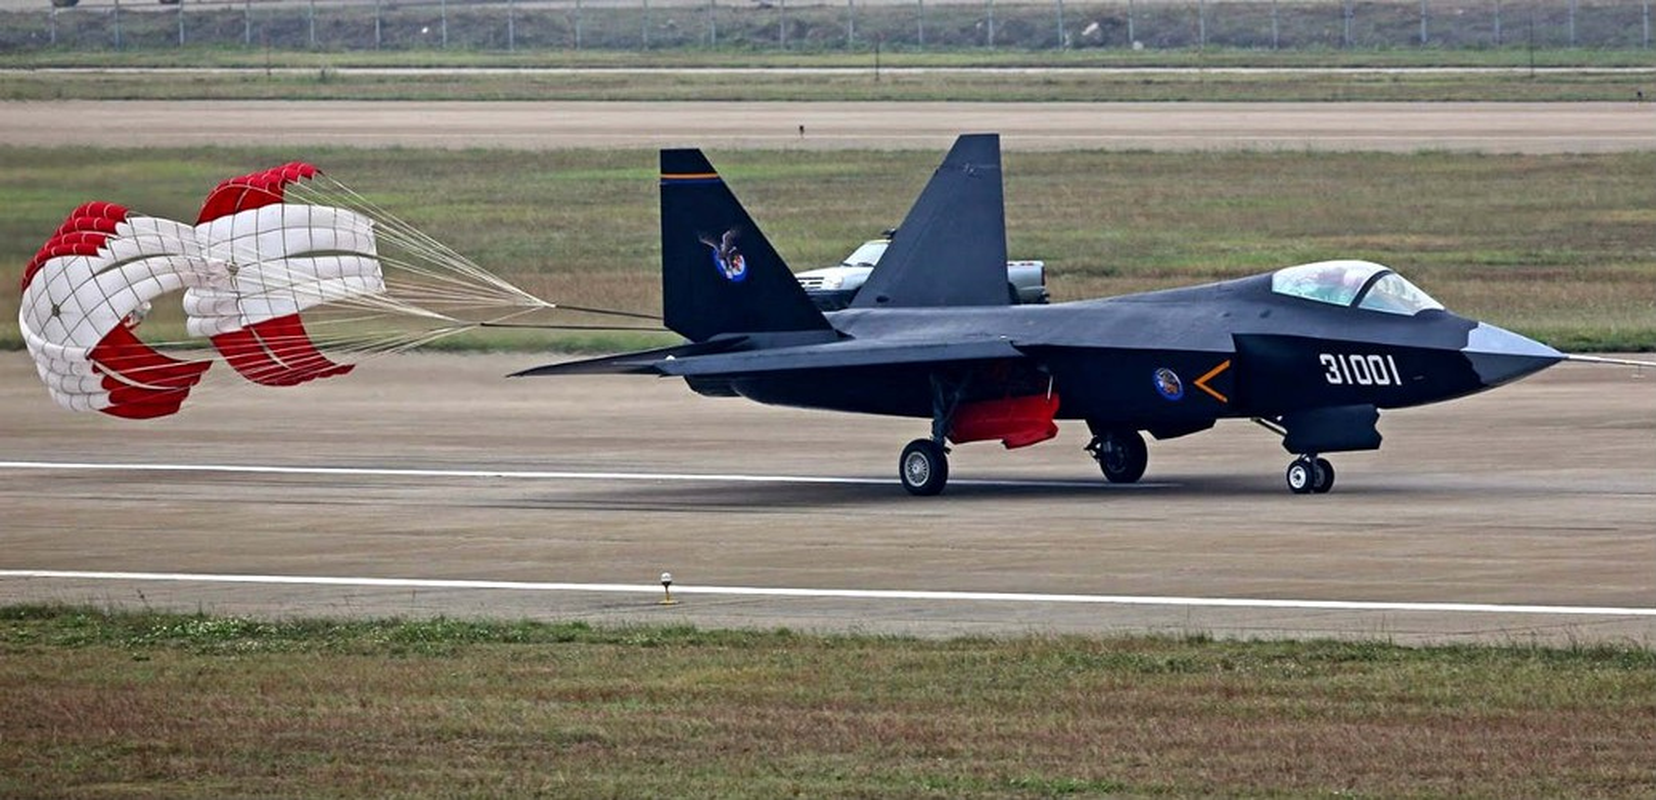 Tiem kich J-31 thu nghiem xong nhung con lau moi cat canh duoc tu tau san bay-Hinh-10